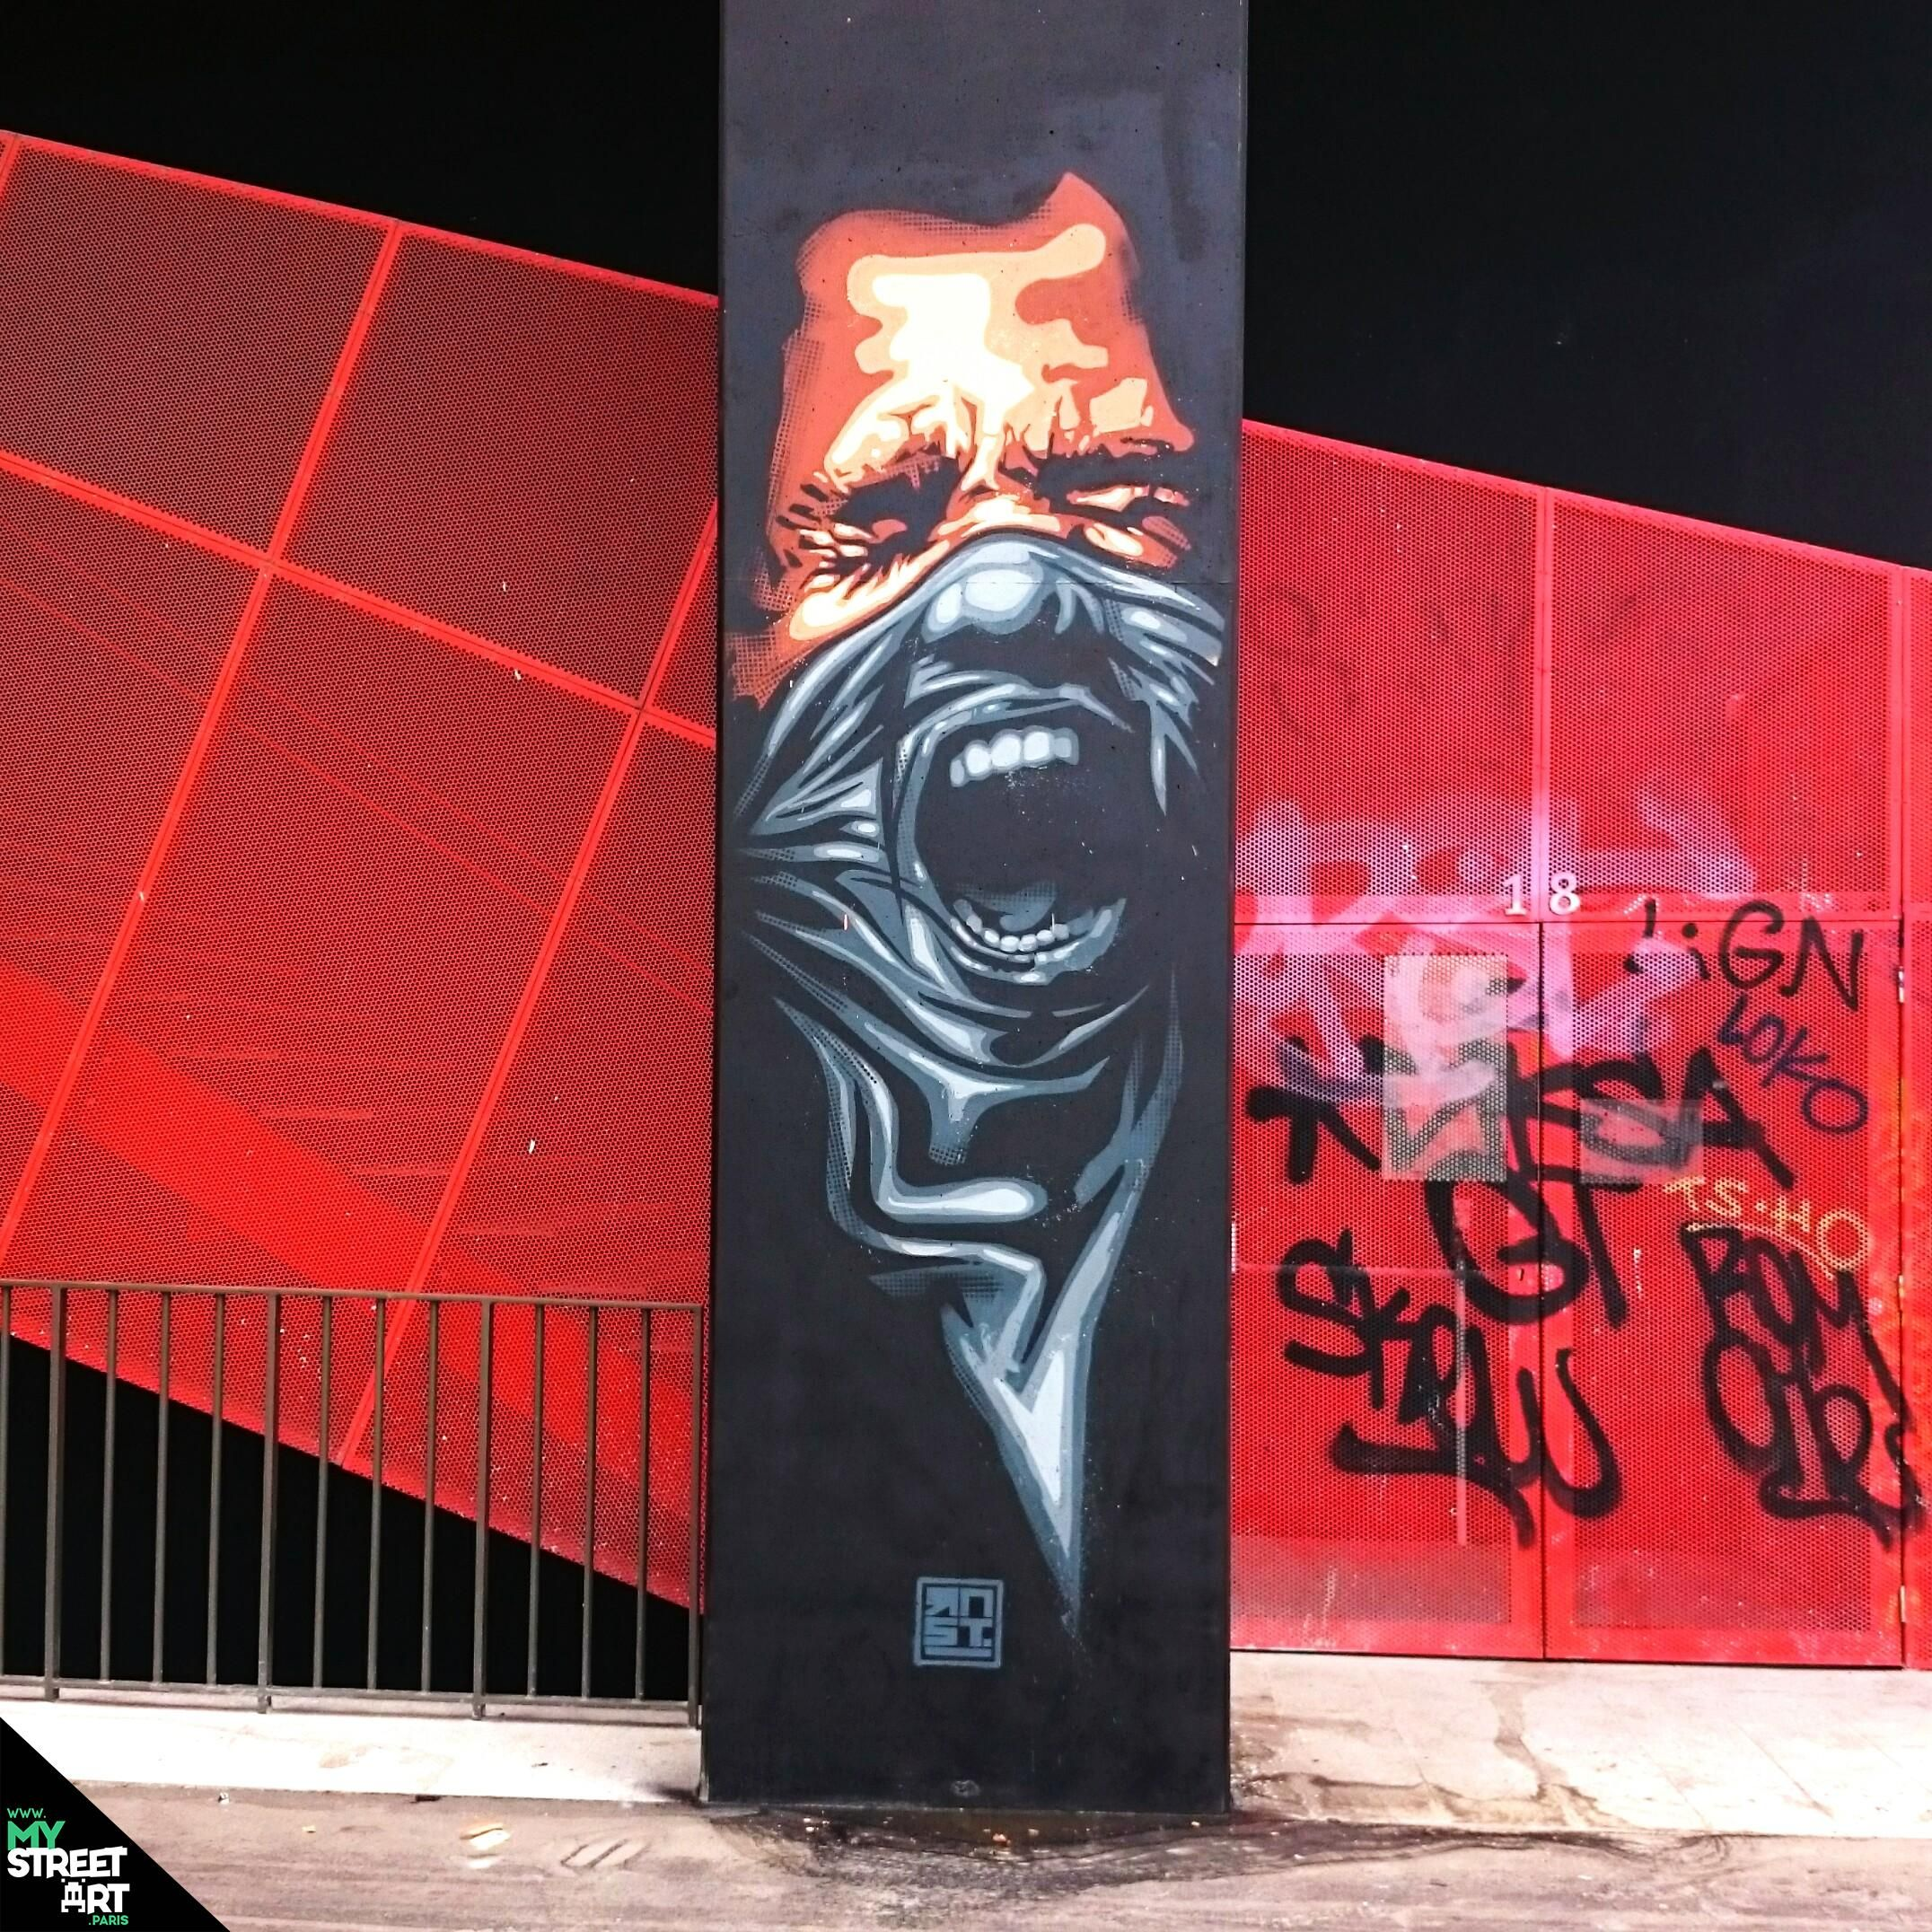 "Paris Street Art - ""Ready To Fight"" by RNST - Paris 13ème - http://my-street-art.paris/paris-street-art-ready-to-fight-by-rnst-paris-13eme/"